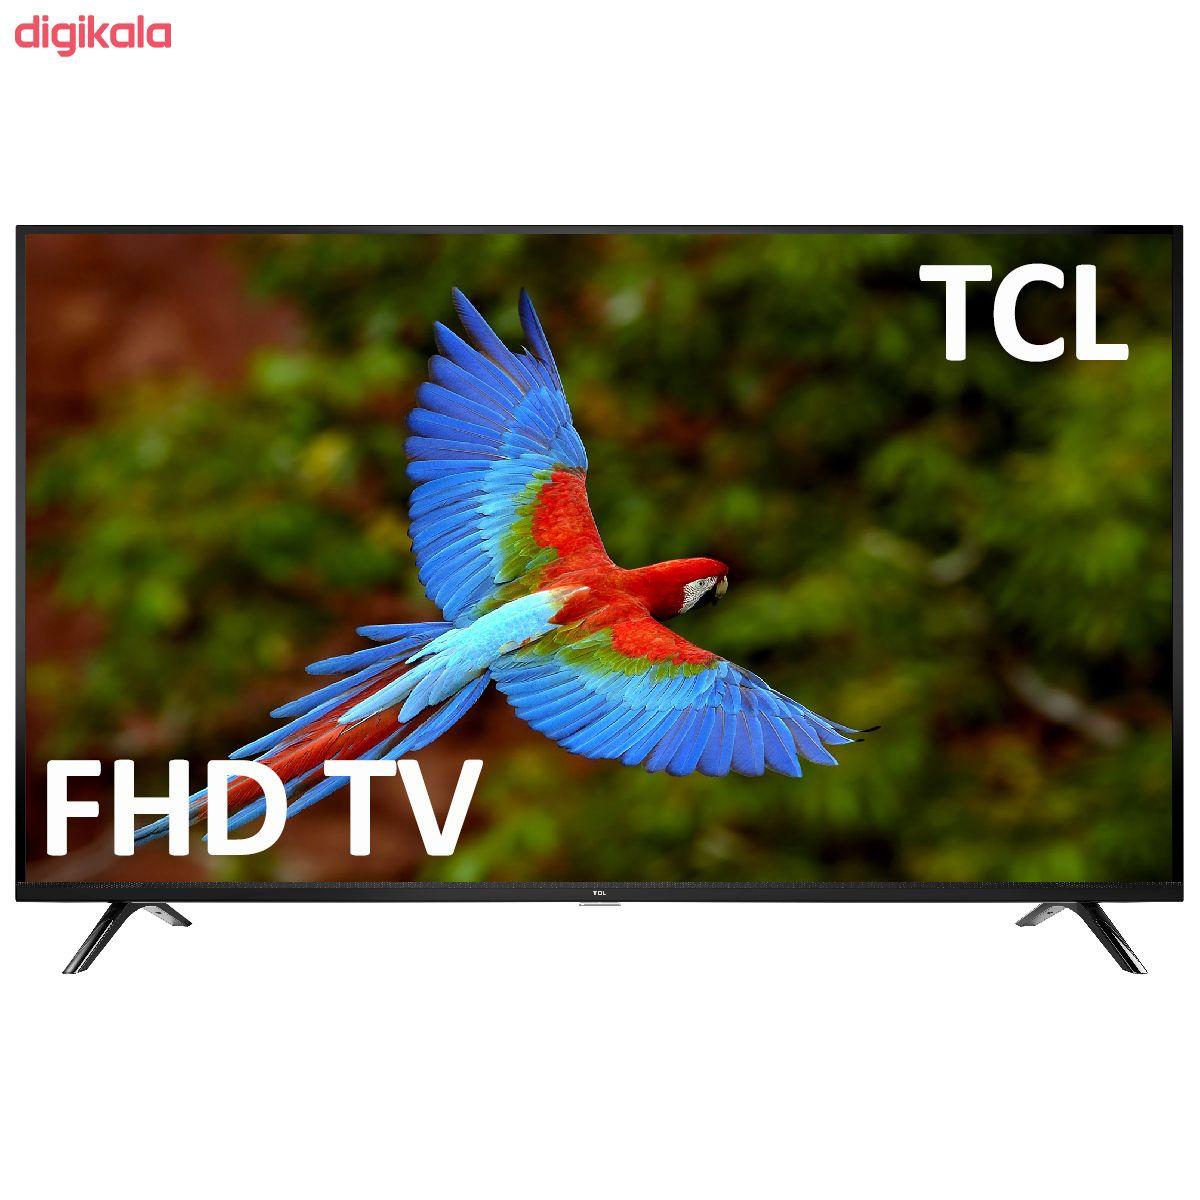 تلویزیون ال ای دی تی سی ال مدل 43D3000i سایز 43 اینچ main 1 1